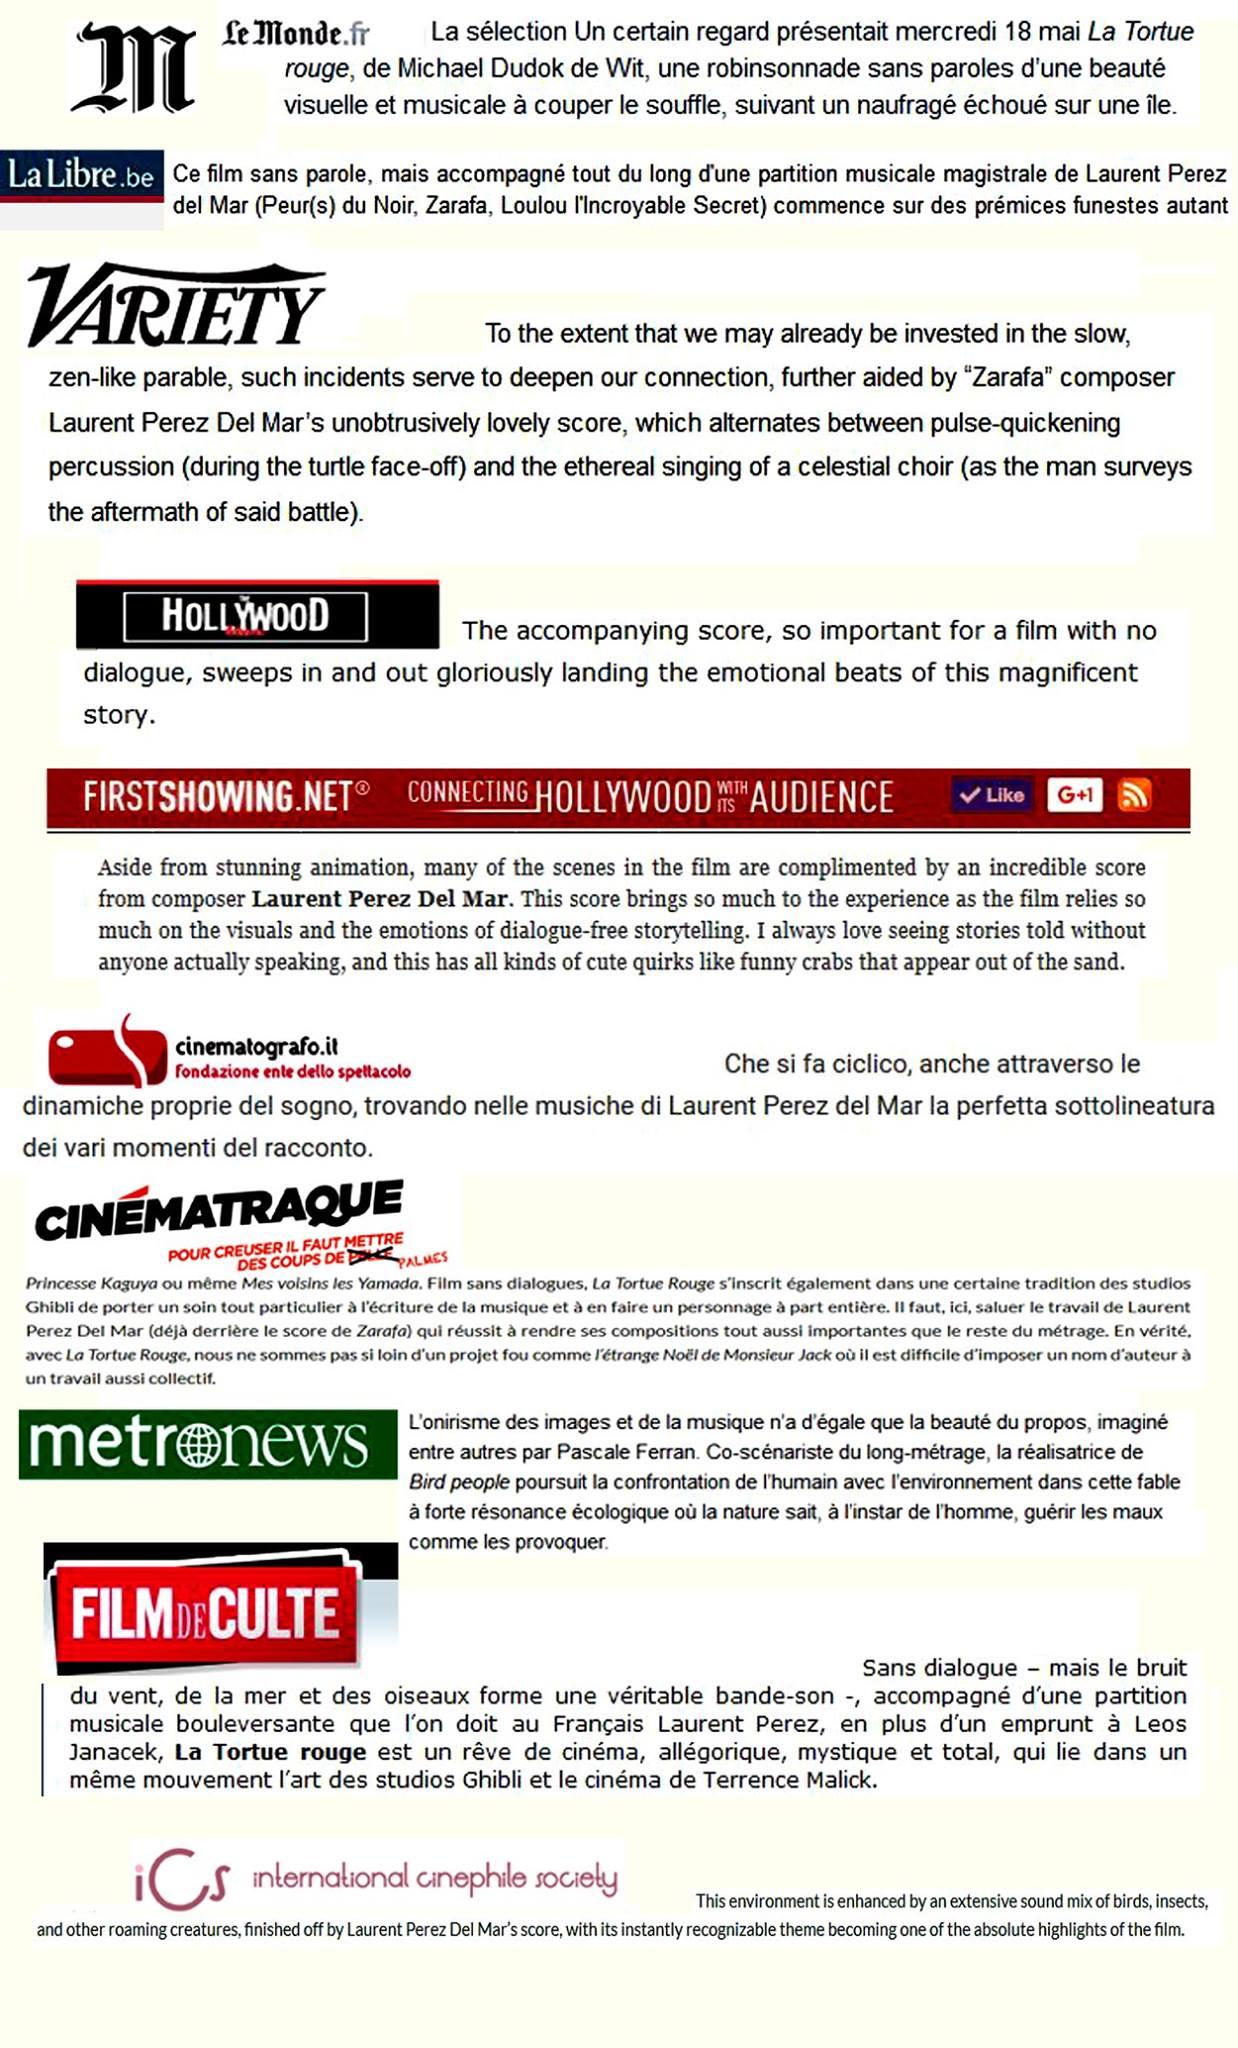 parfaites film download